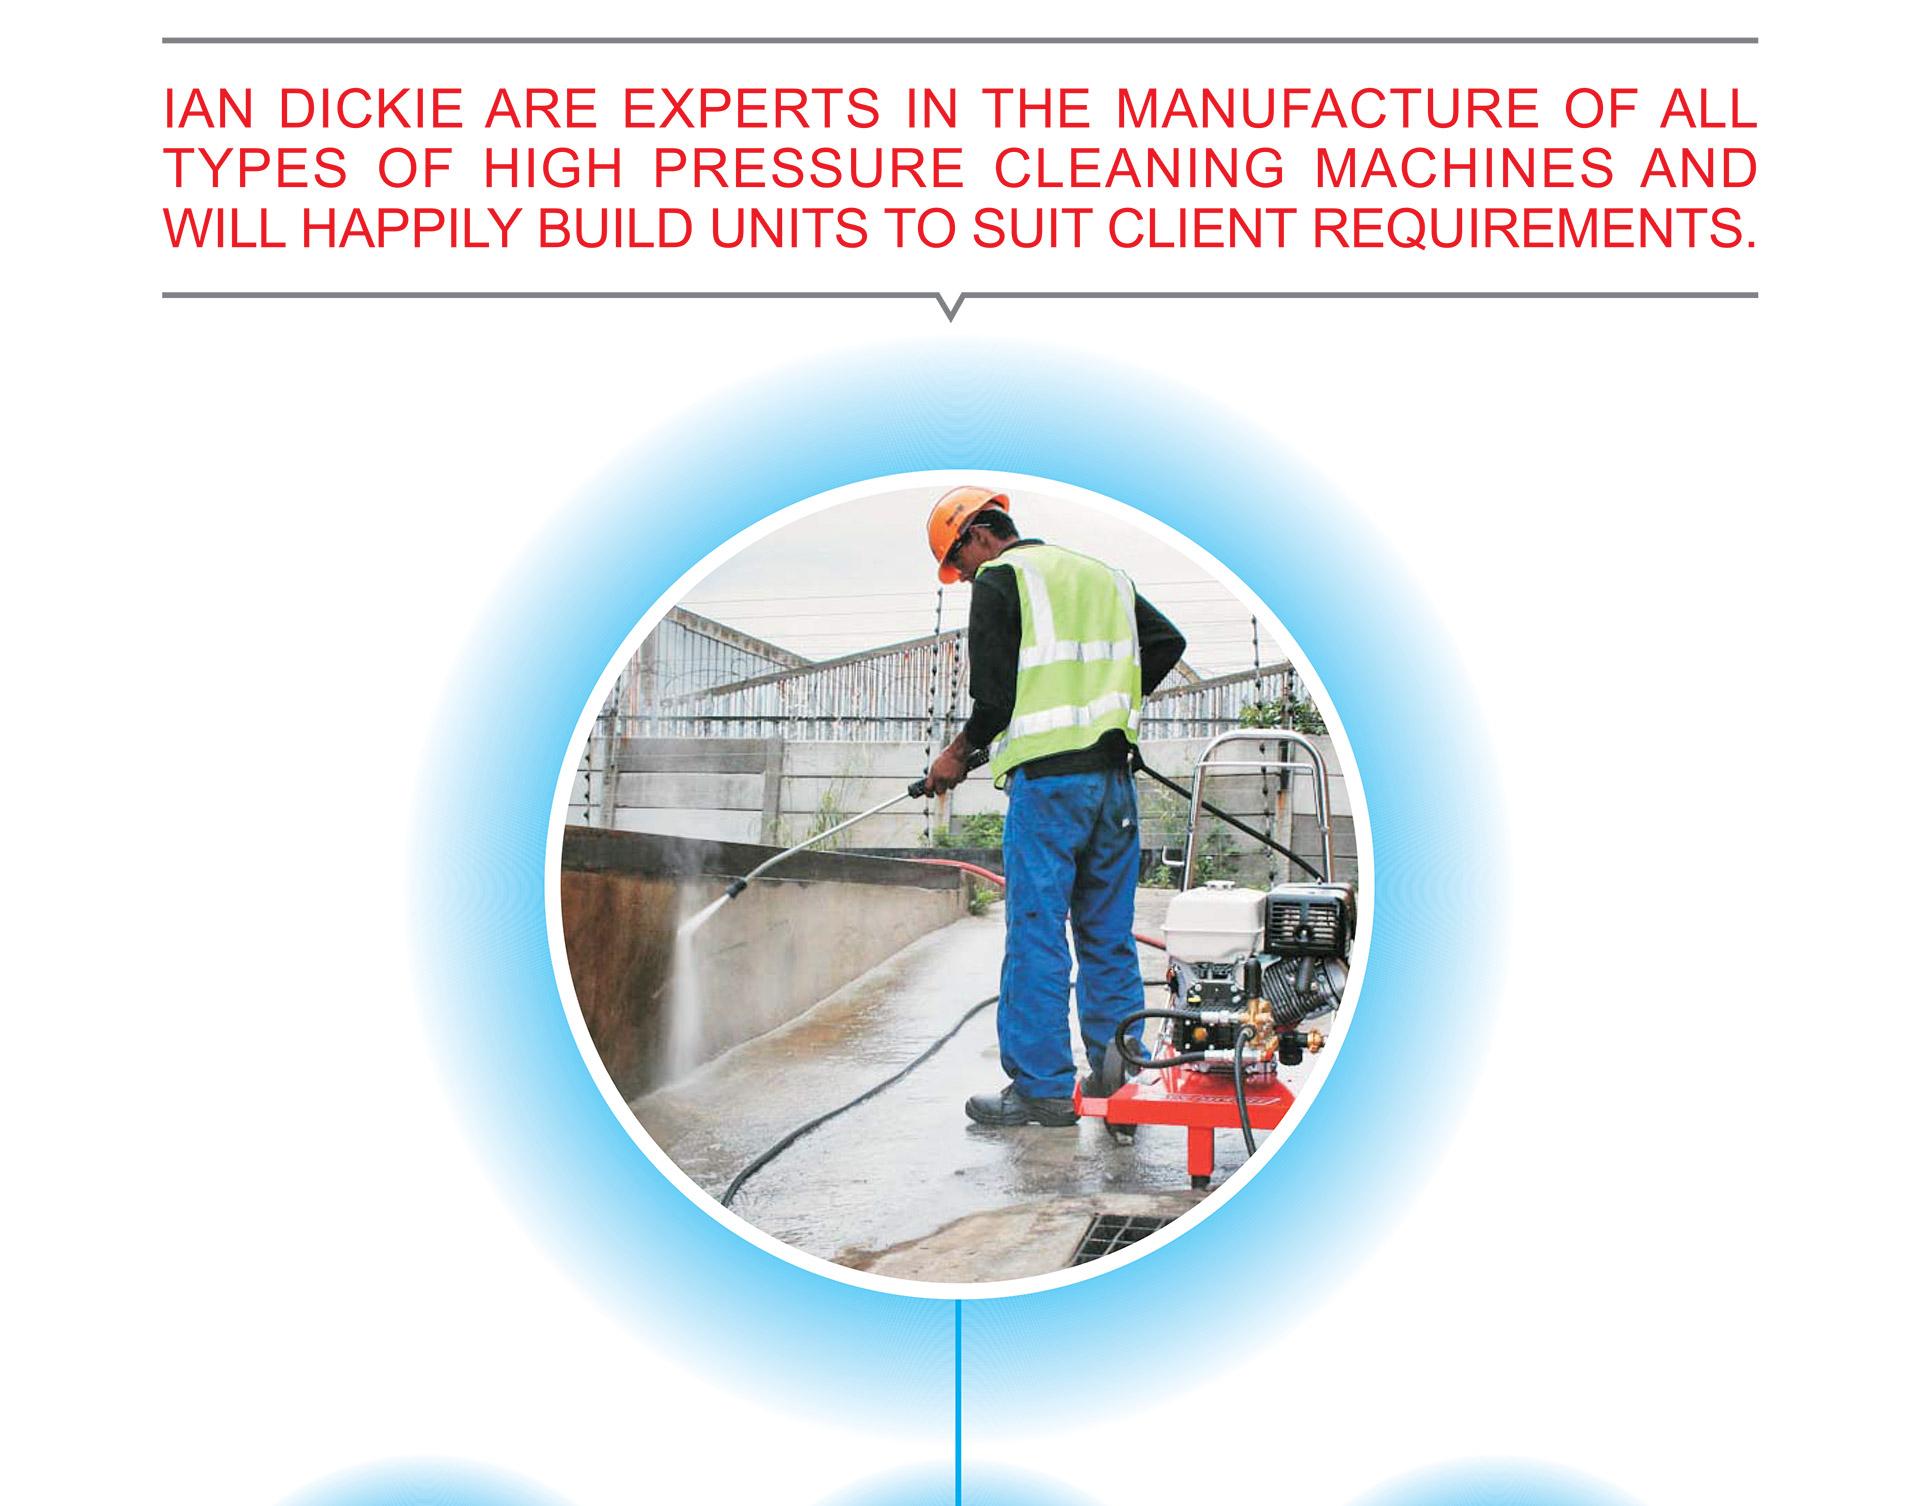 Ian Dickie's High Pressure Cleaners